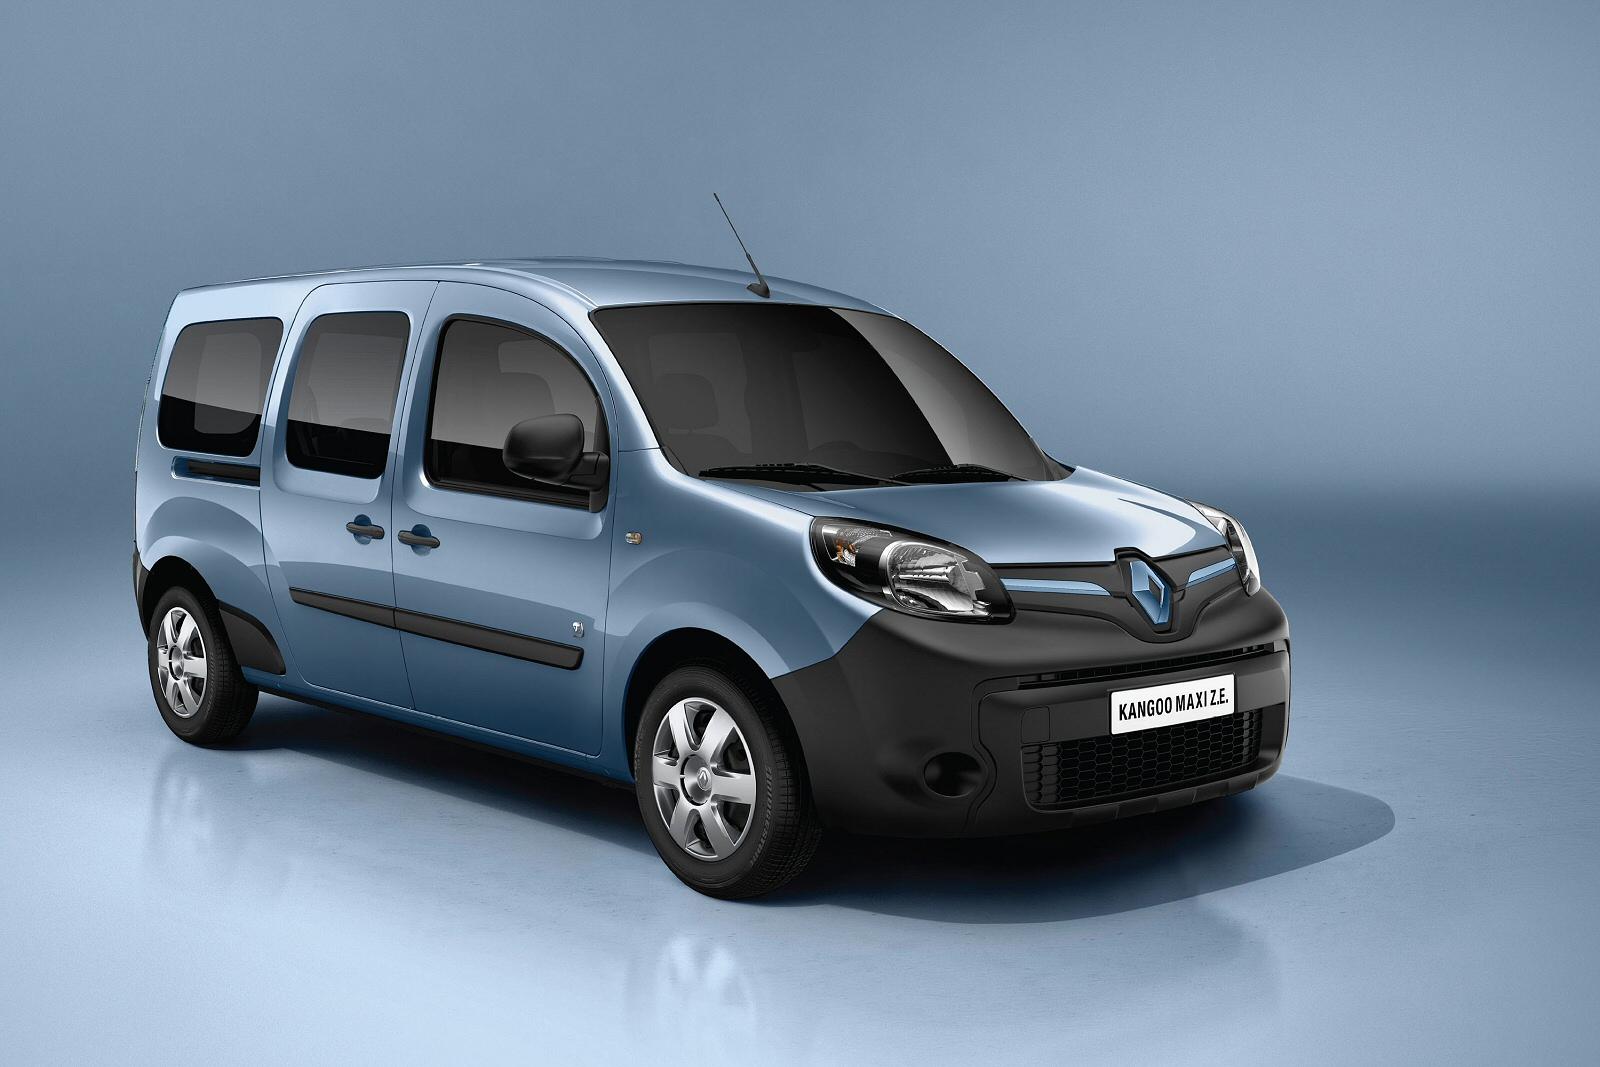 140445c26b New Renault Kangoo Maxi Diesel LL21dCi 110 Business Crew Van Auto ...